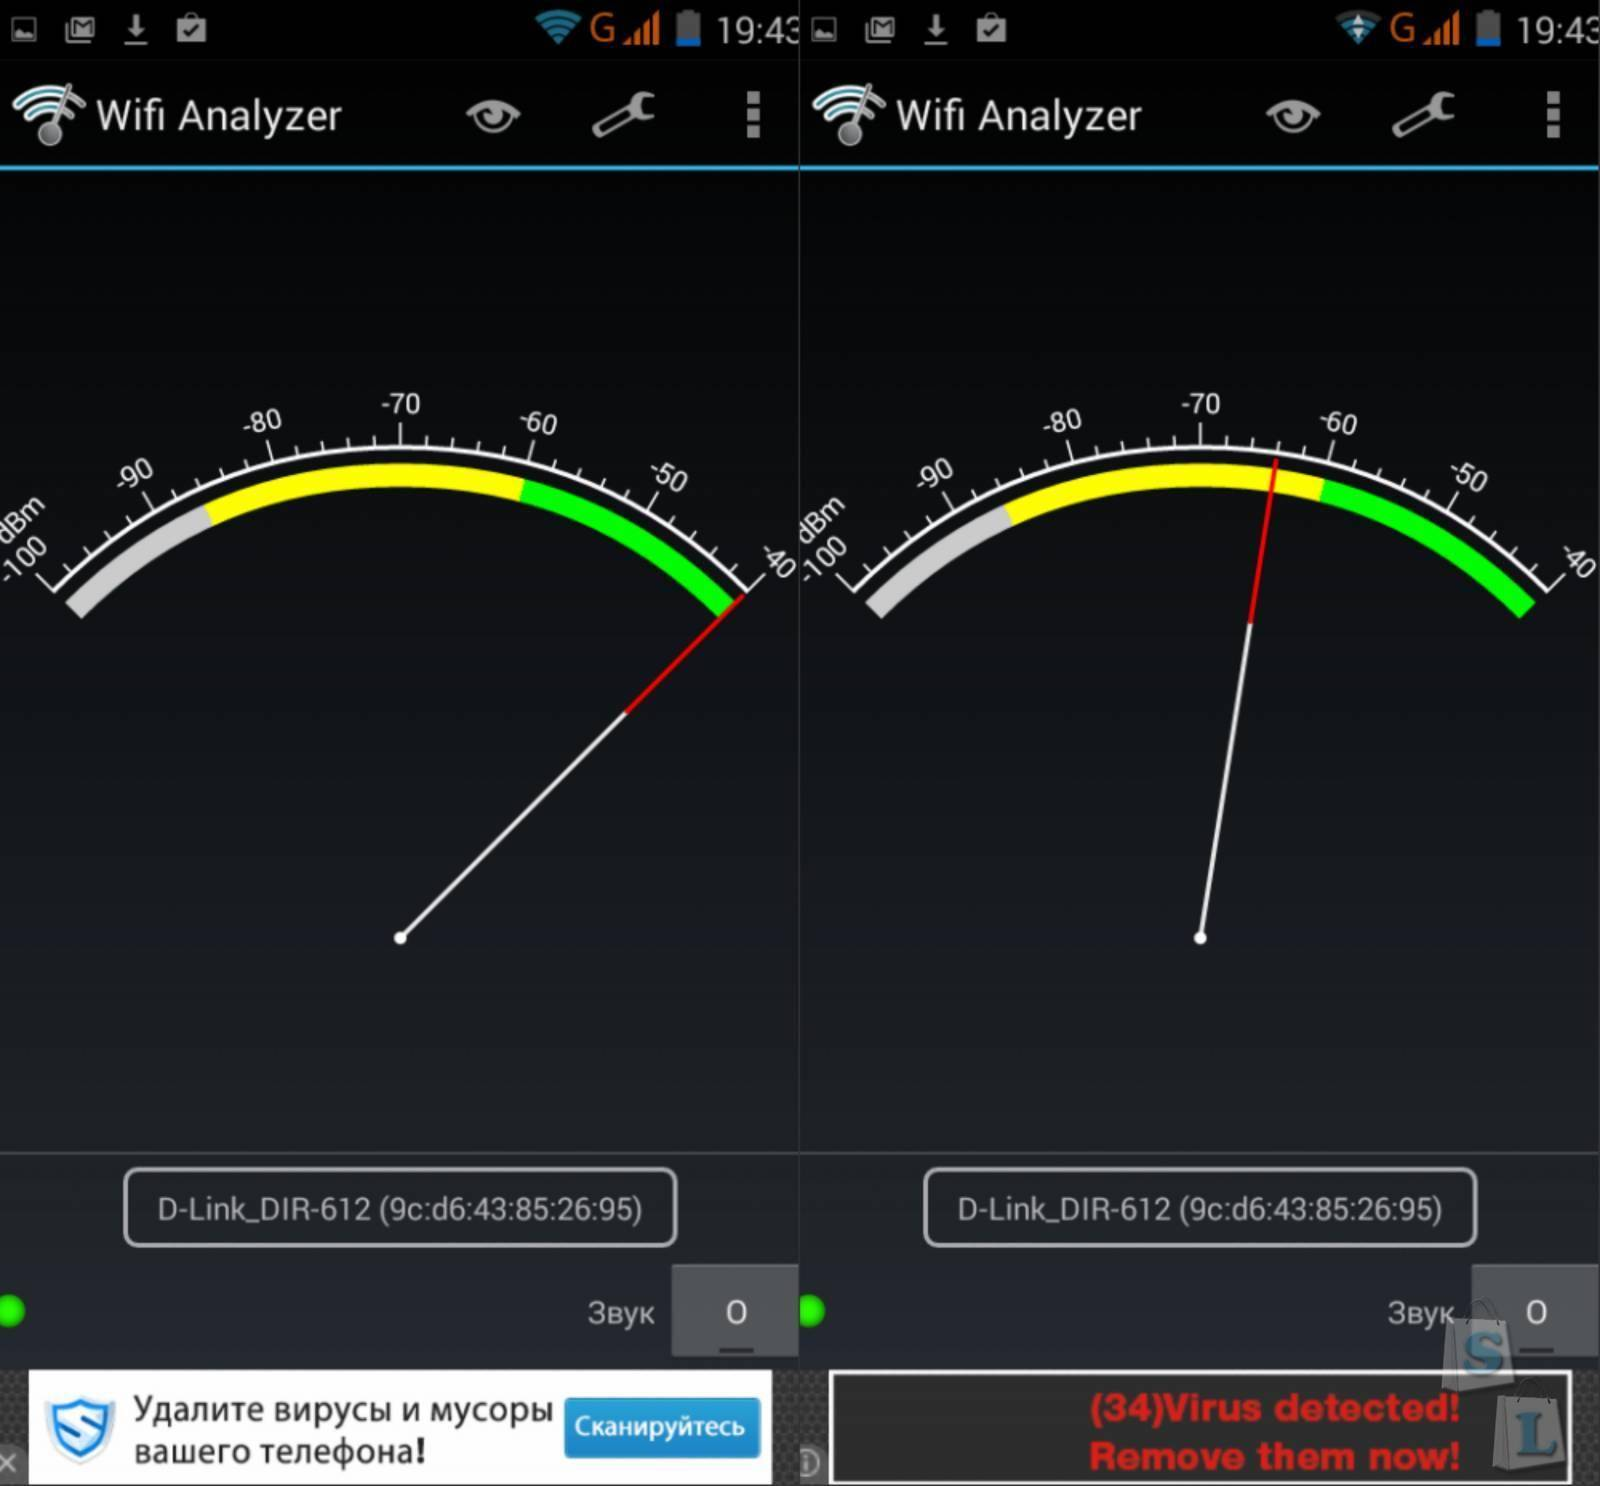 GearBest: Elephone P6I